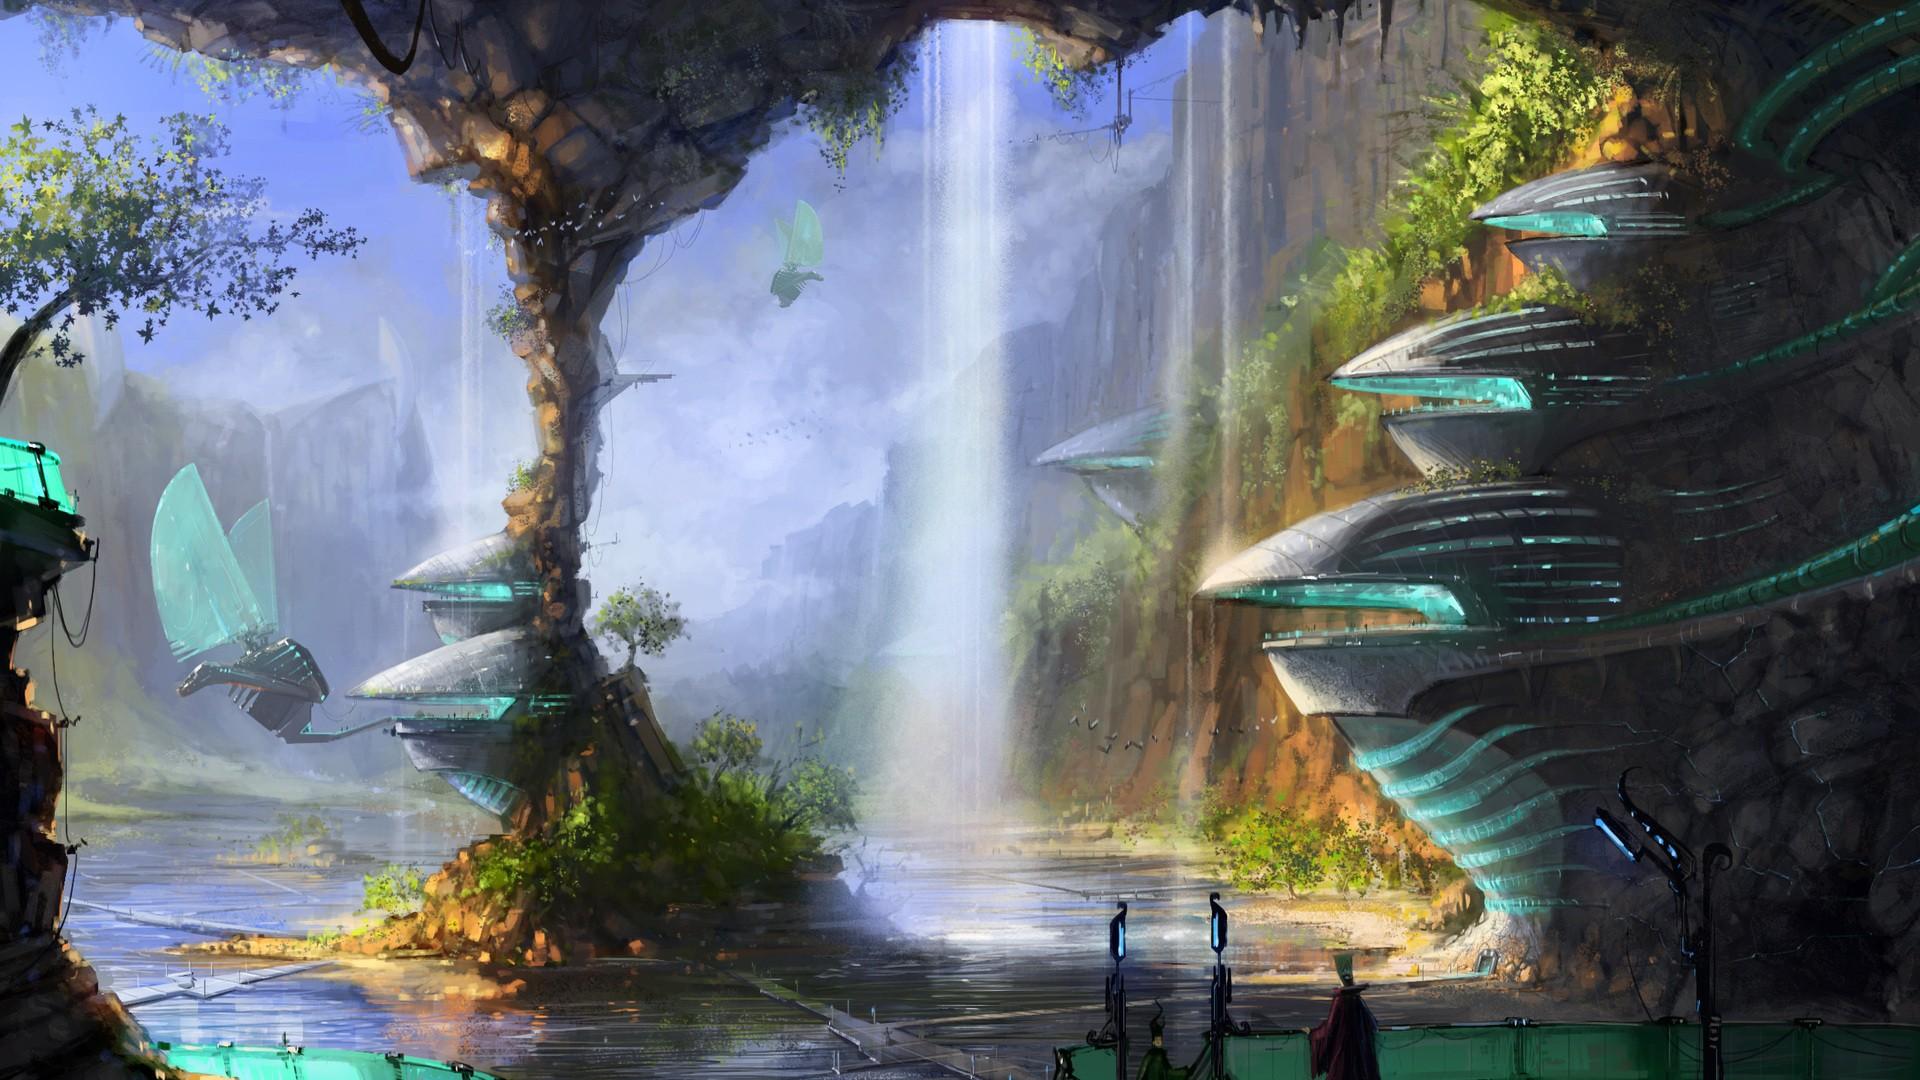 49 Wallpaper Science Fiction On Wallpapersafari